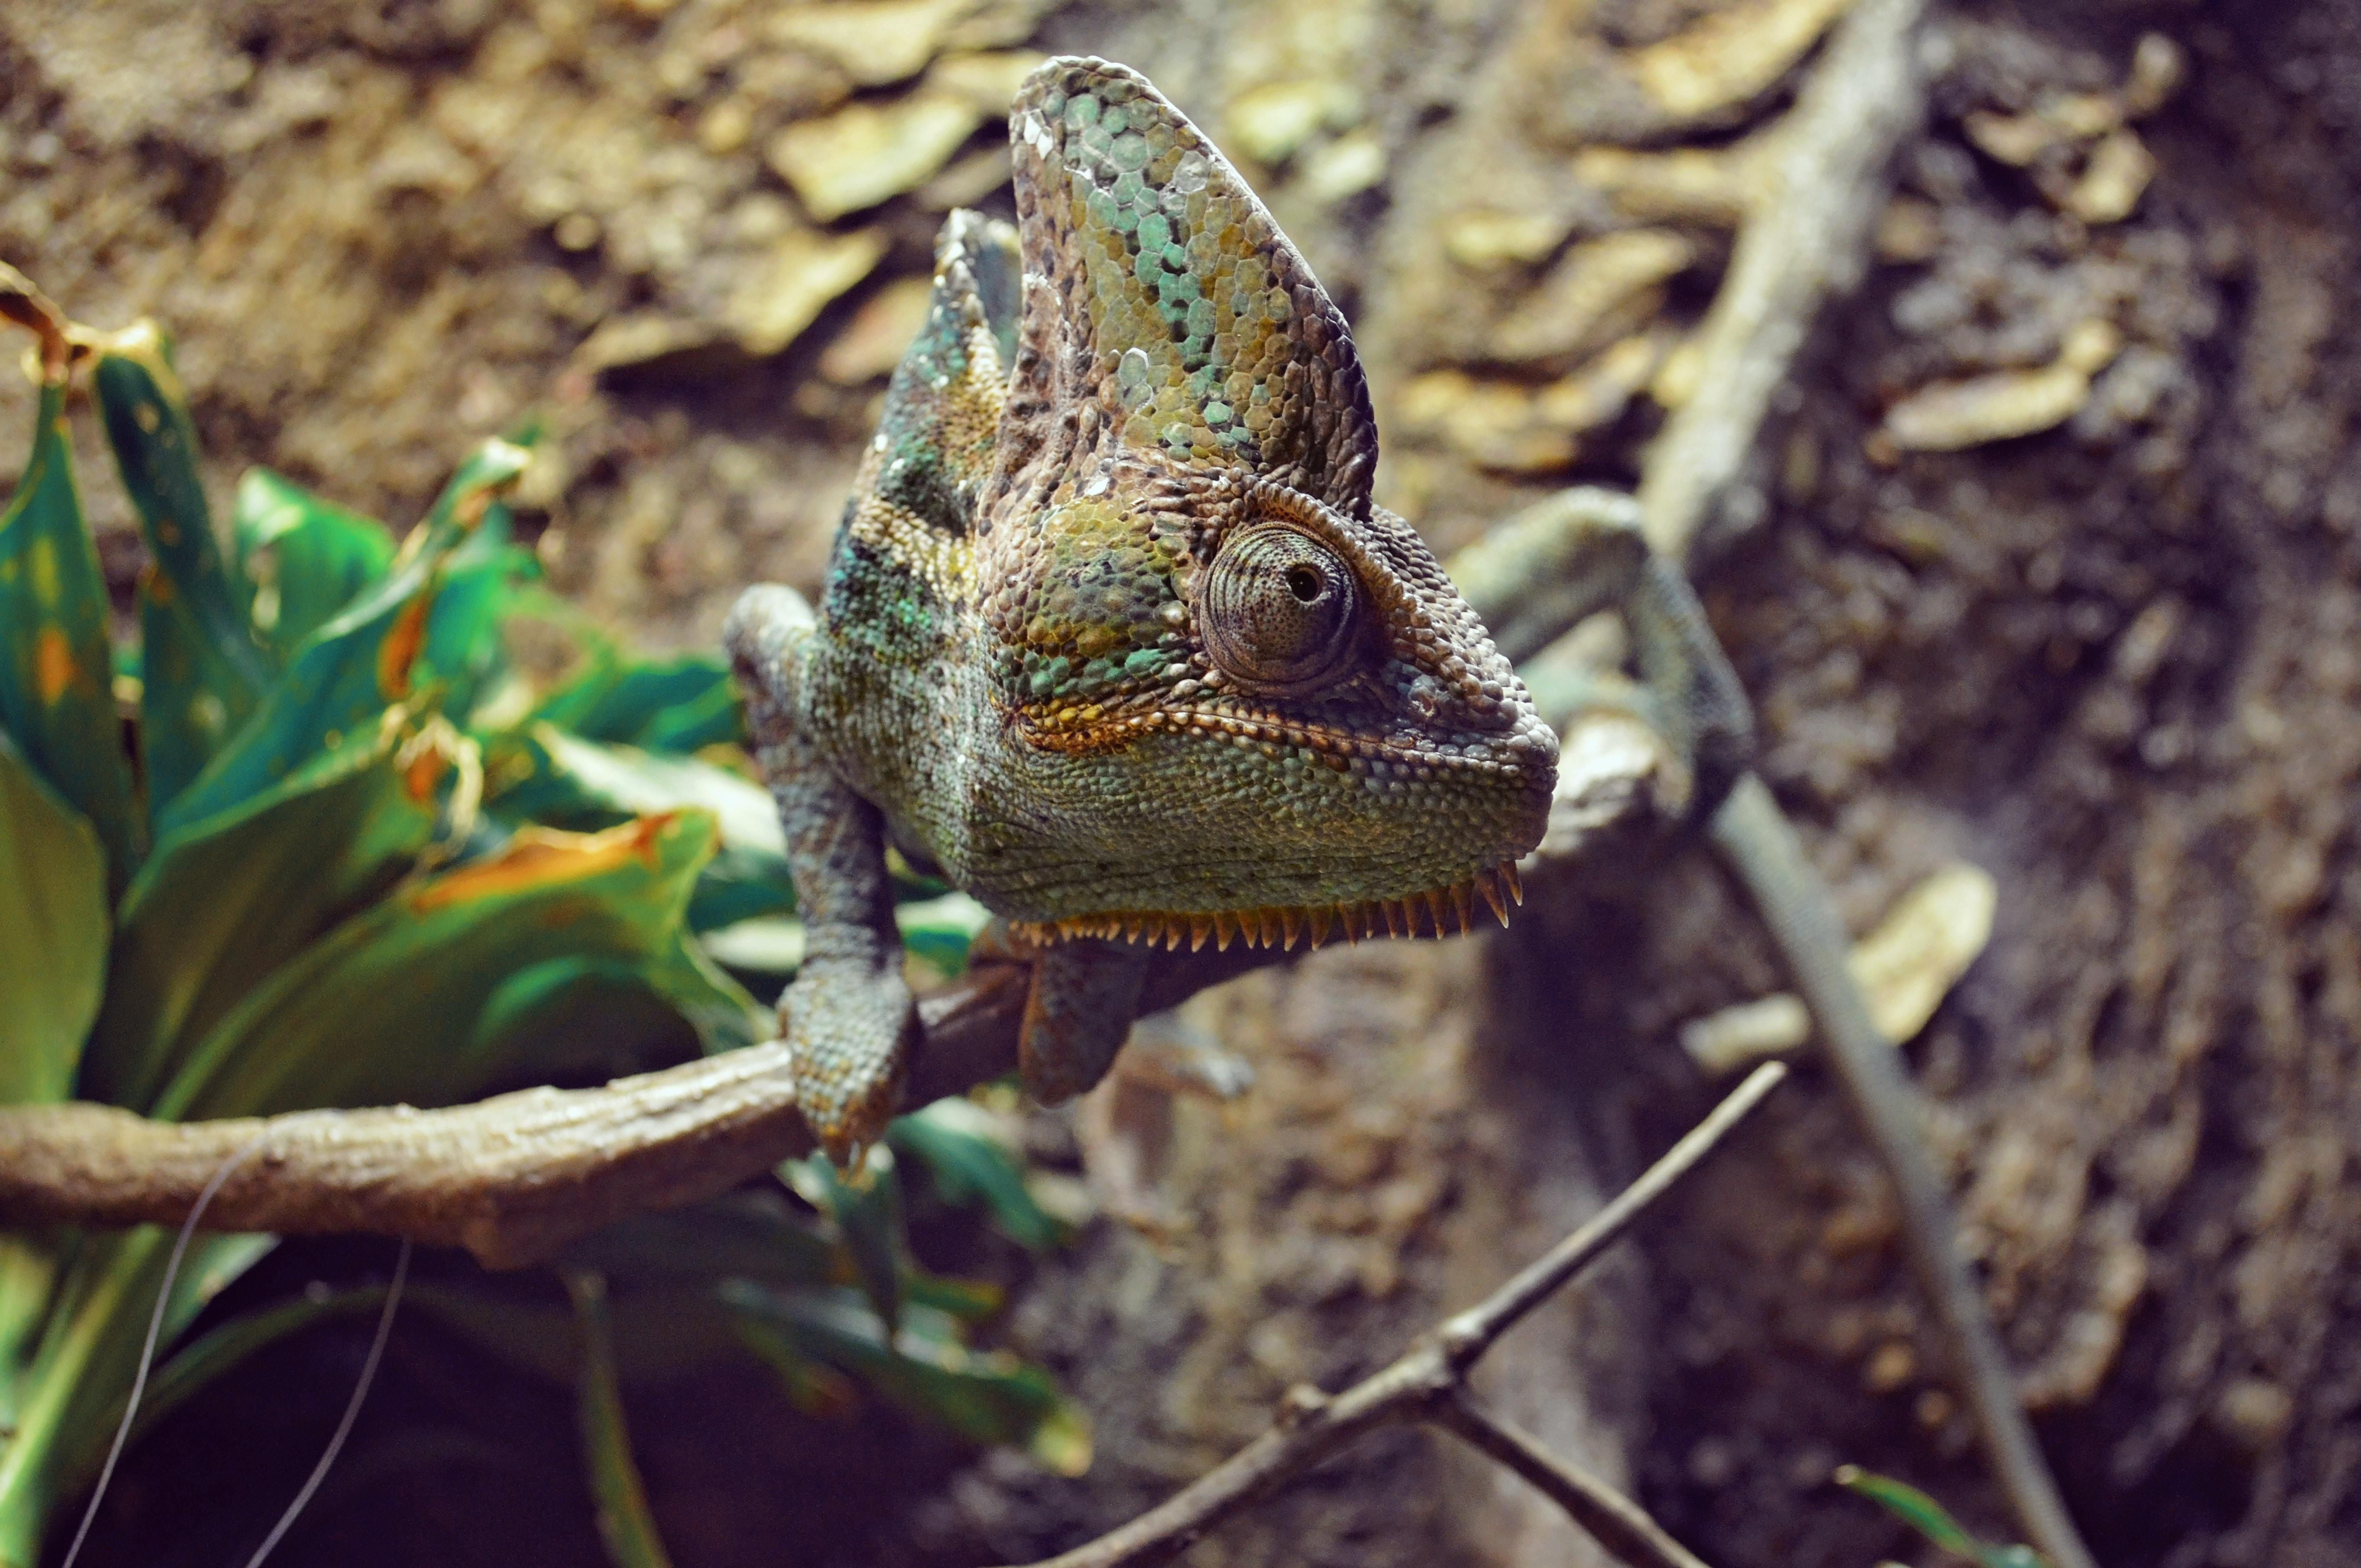 brown chameleon branch